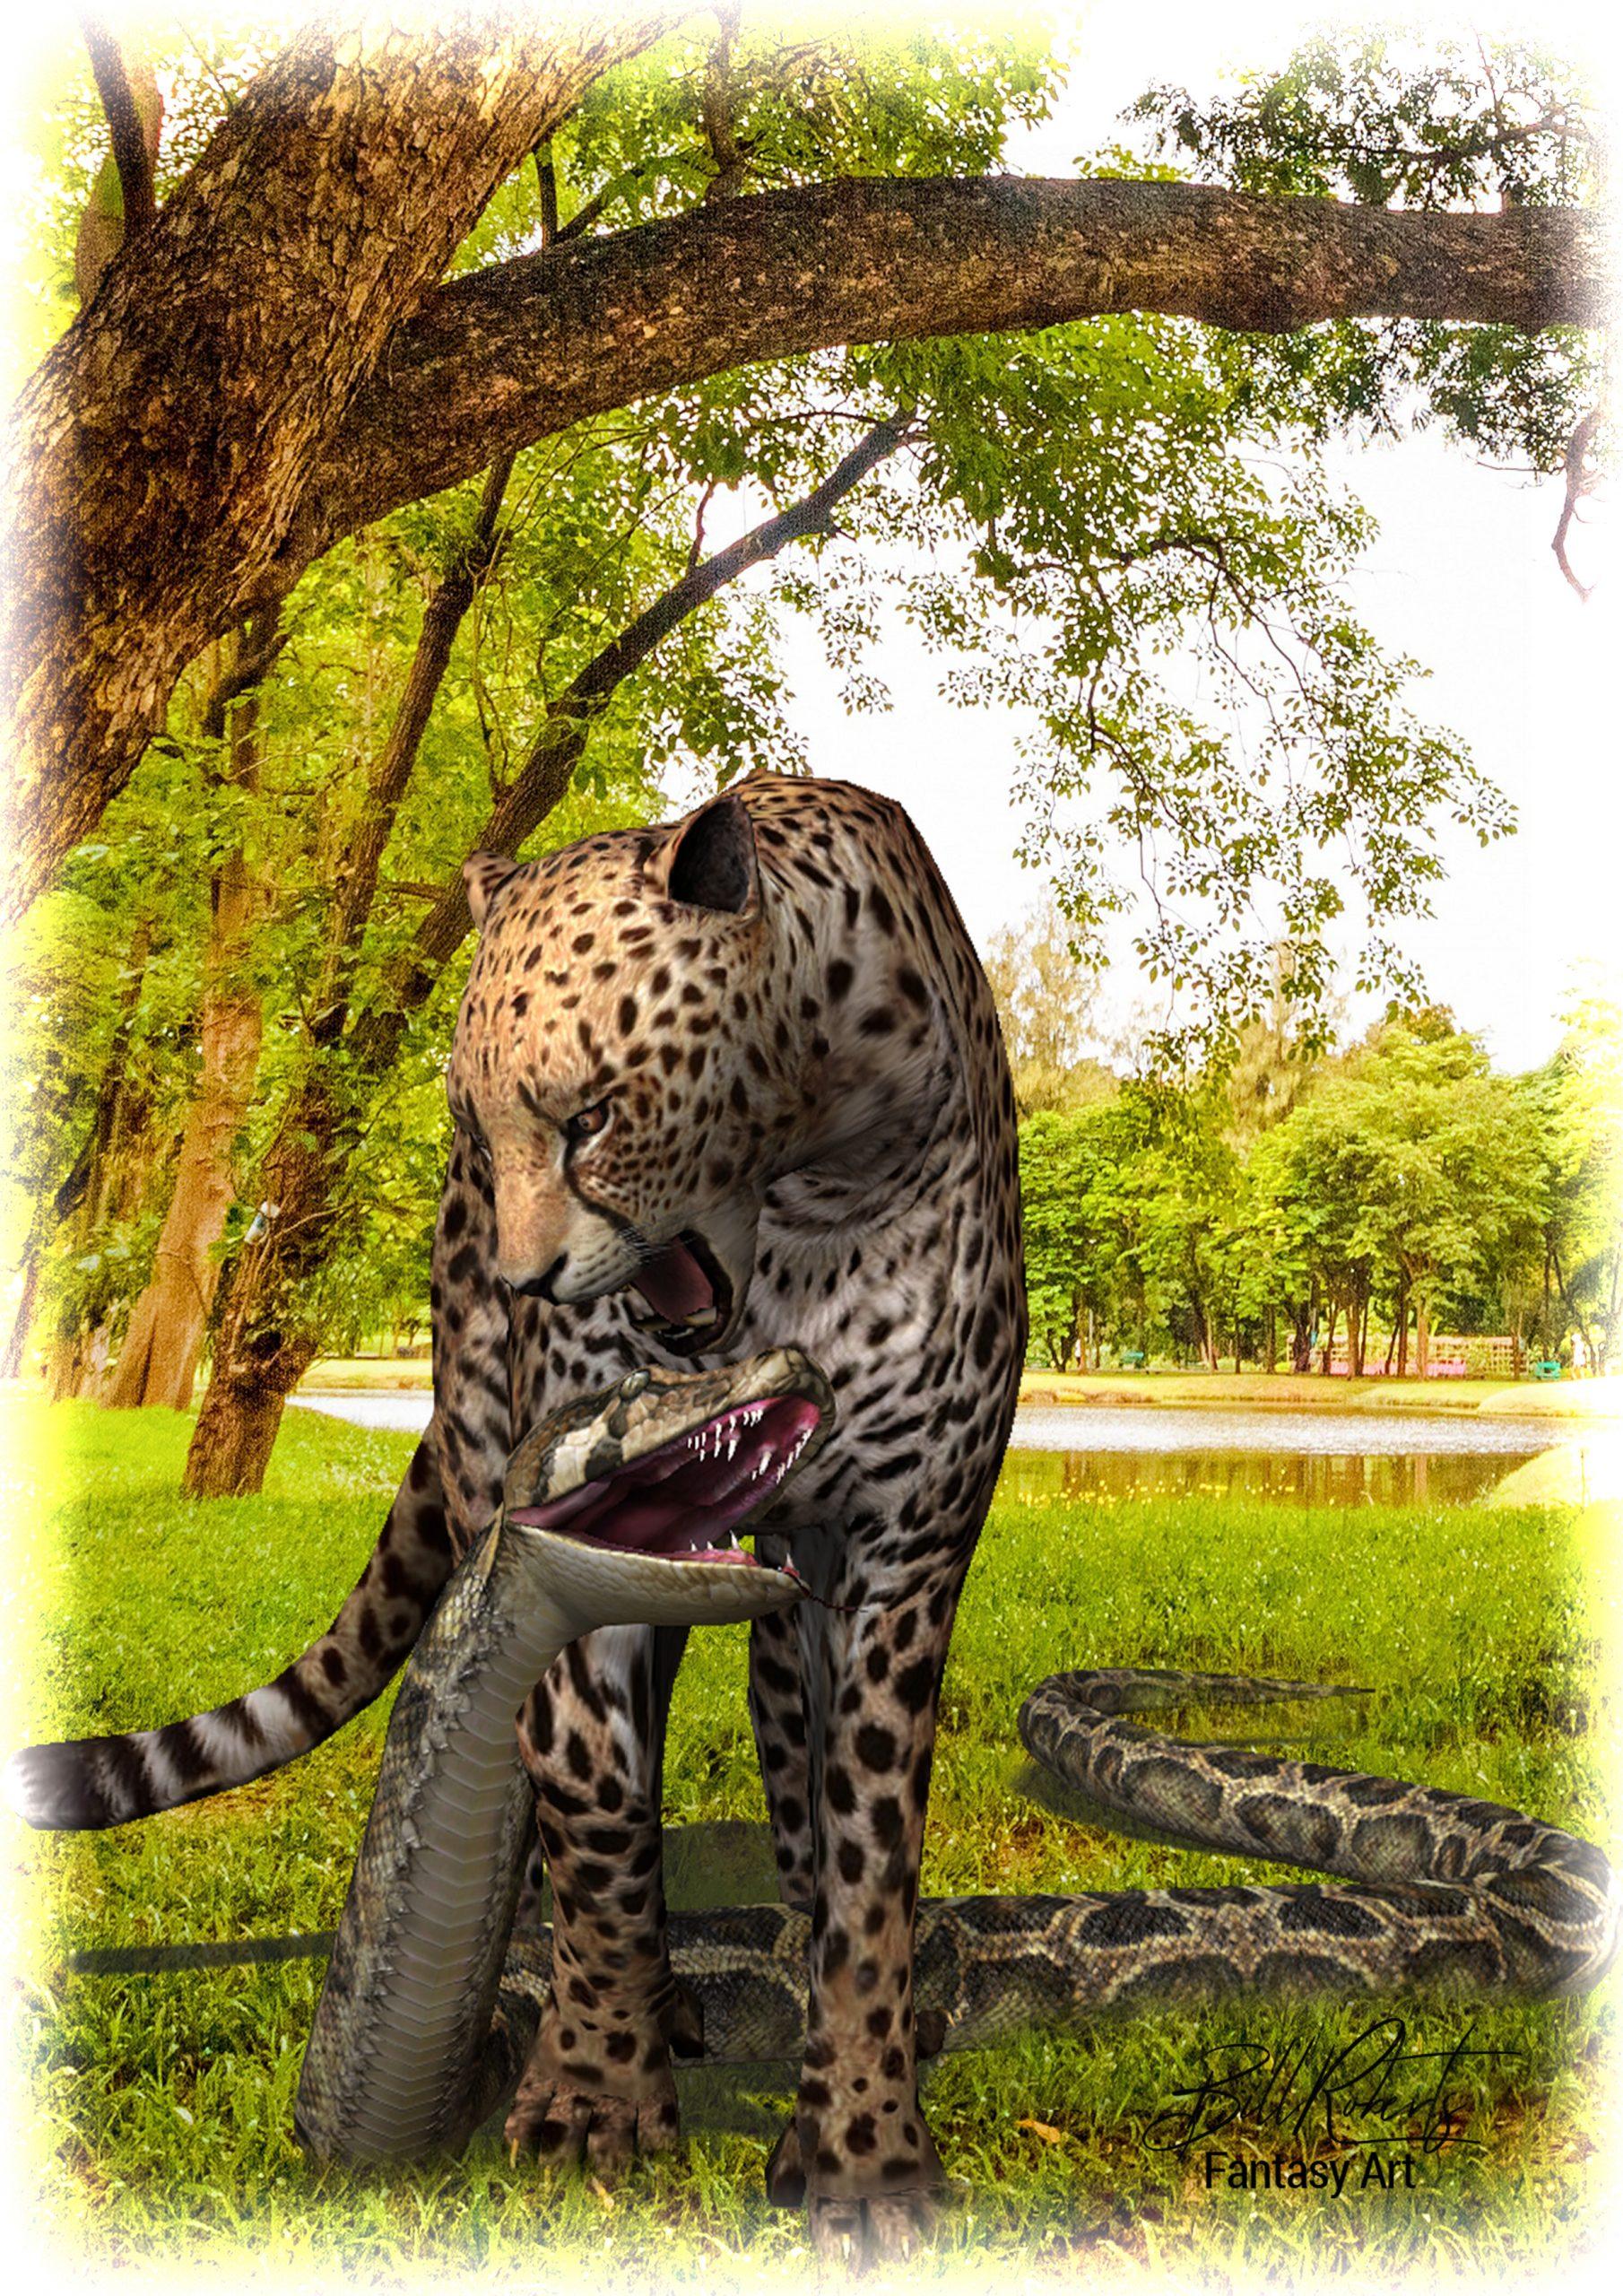 Cheetah & Python